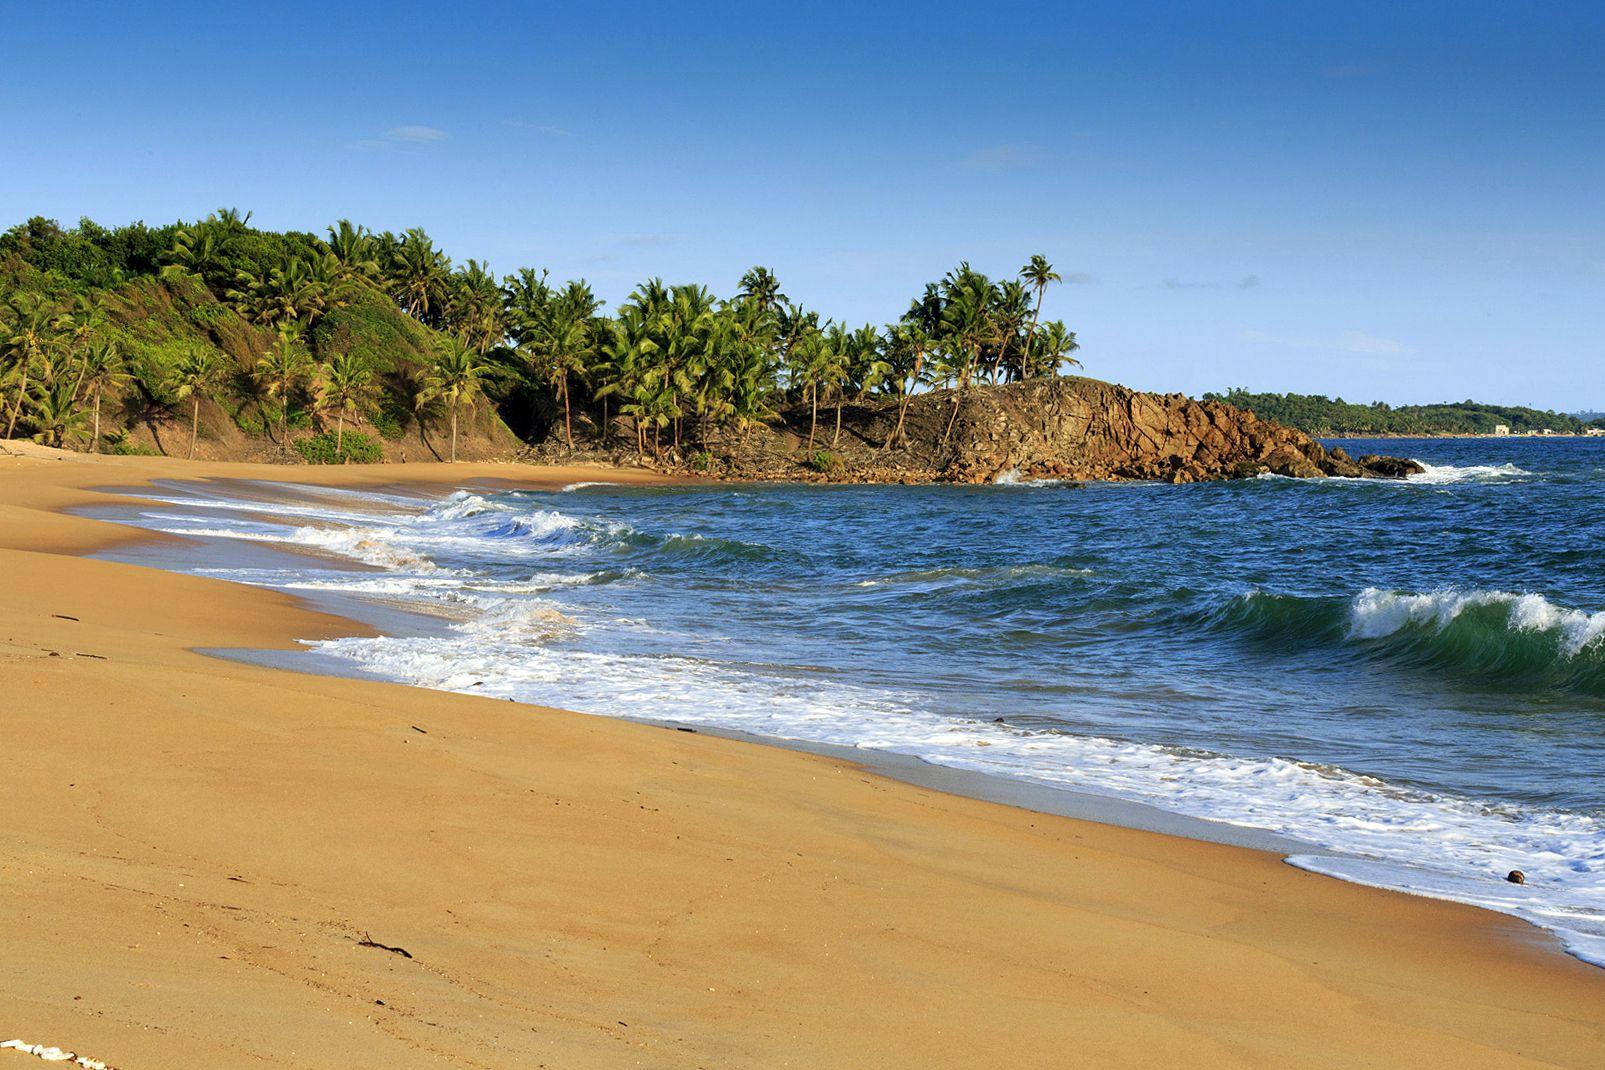 Afrique, ghana, plage, mer, axim